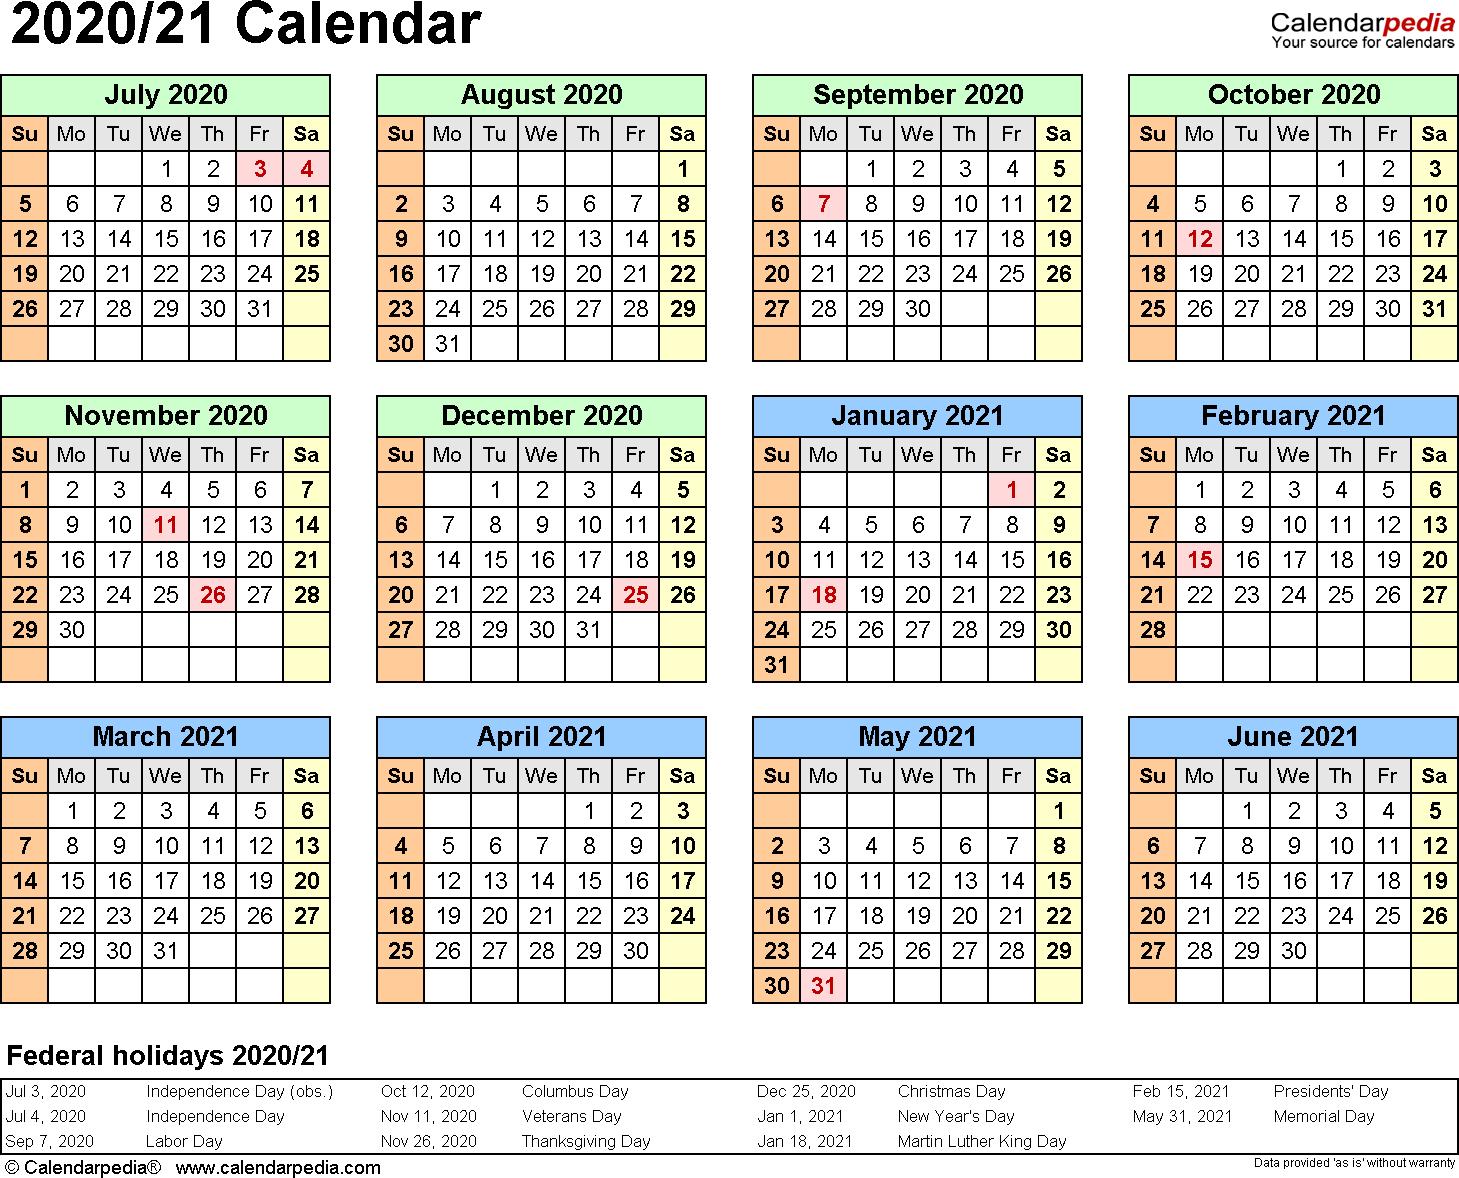 Split Year Calendar 2020/21 (July To June) - Word Templates